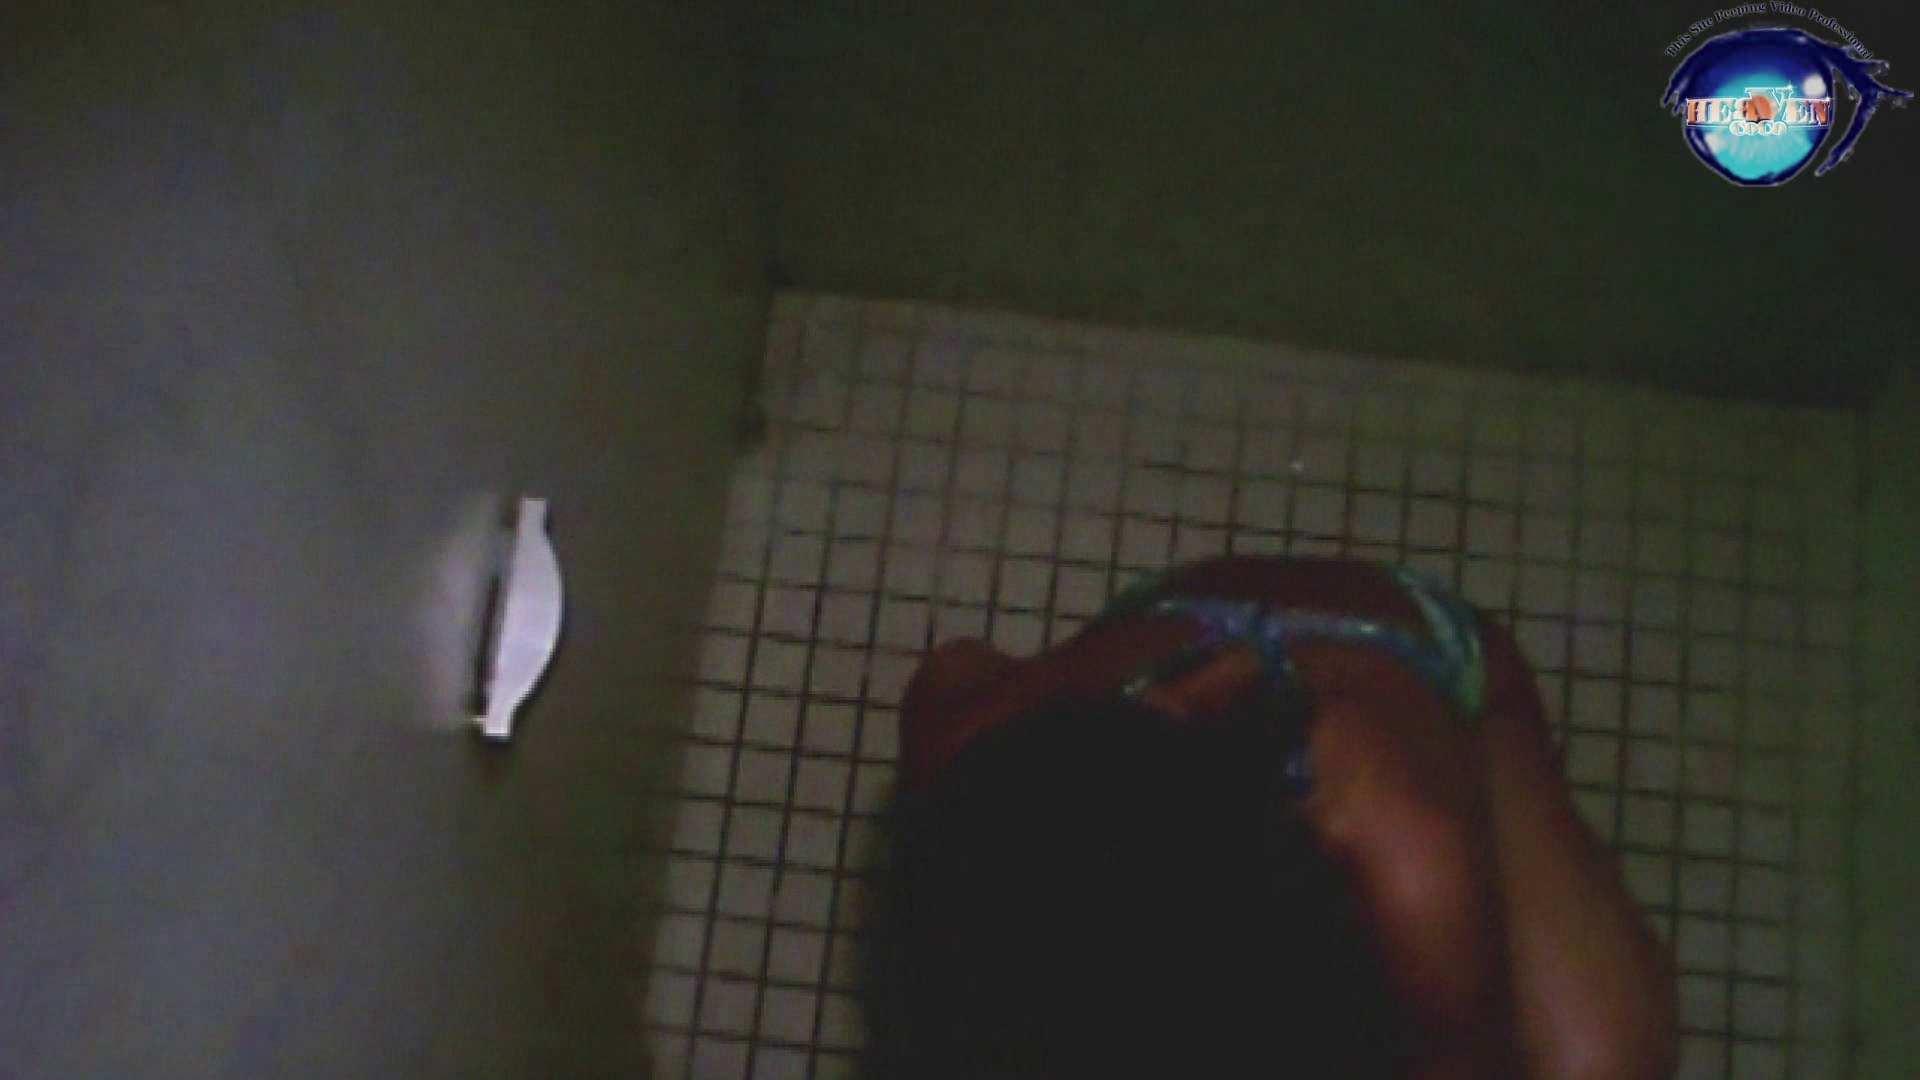 水泳大会選手の聖水 vol.09 トイレ   全裸 盗撮 106PIX 85